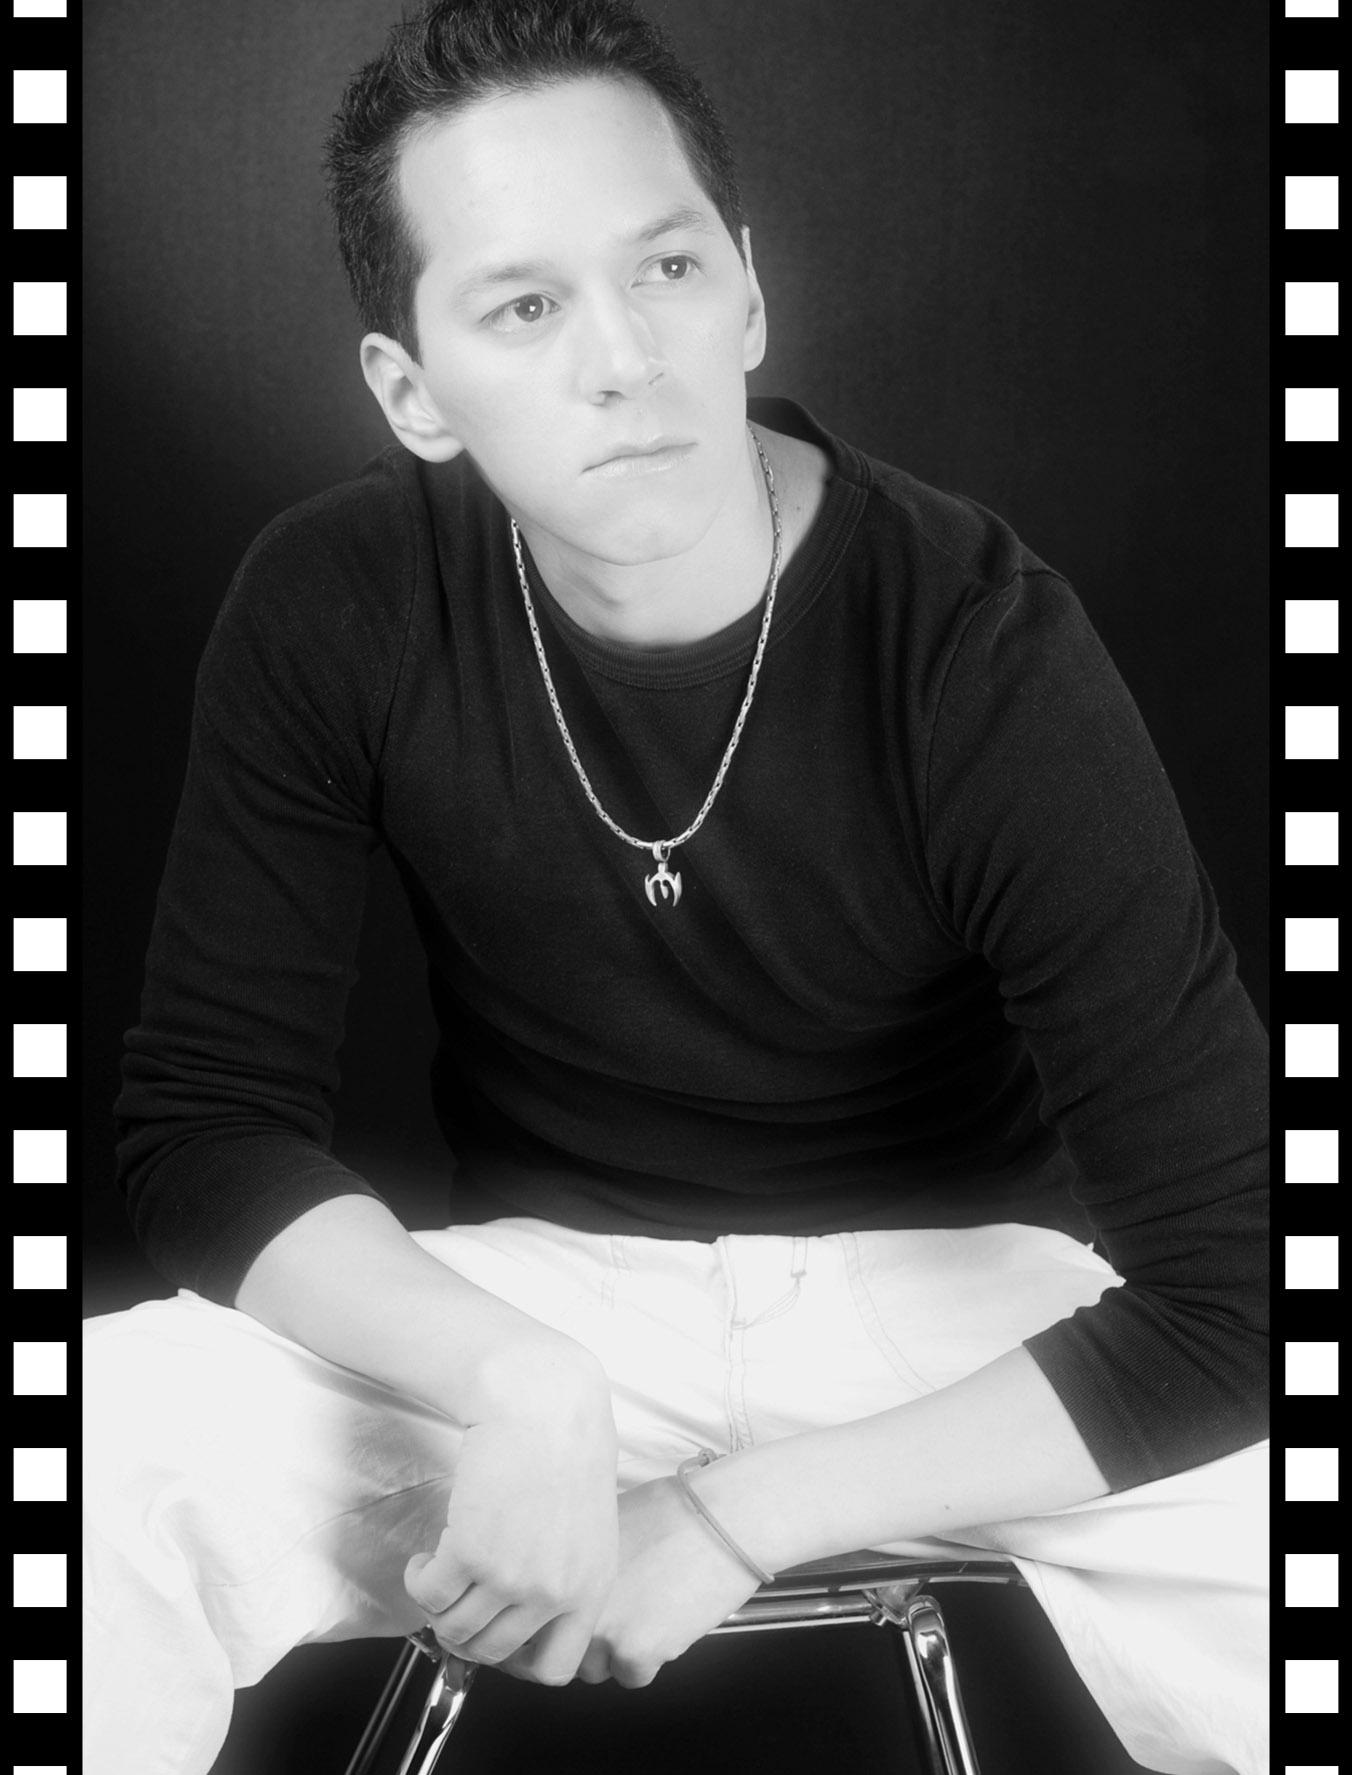 Model: Zash Denzel